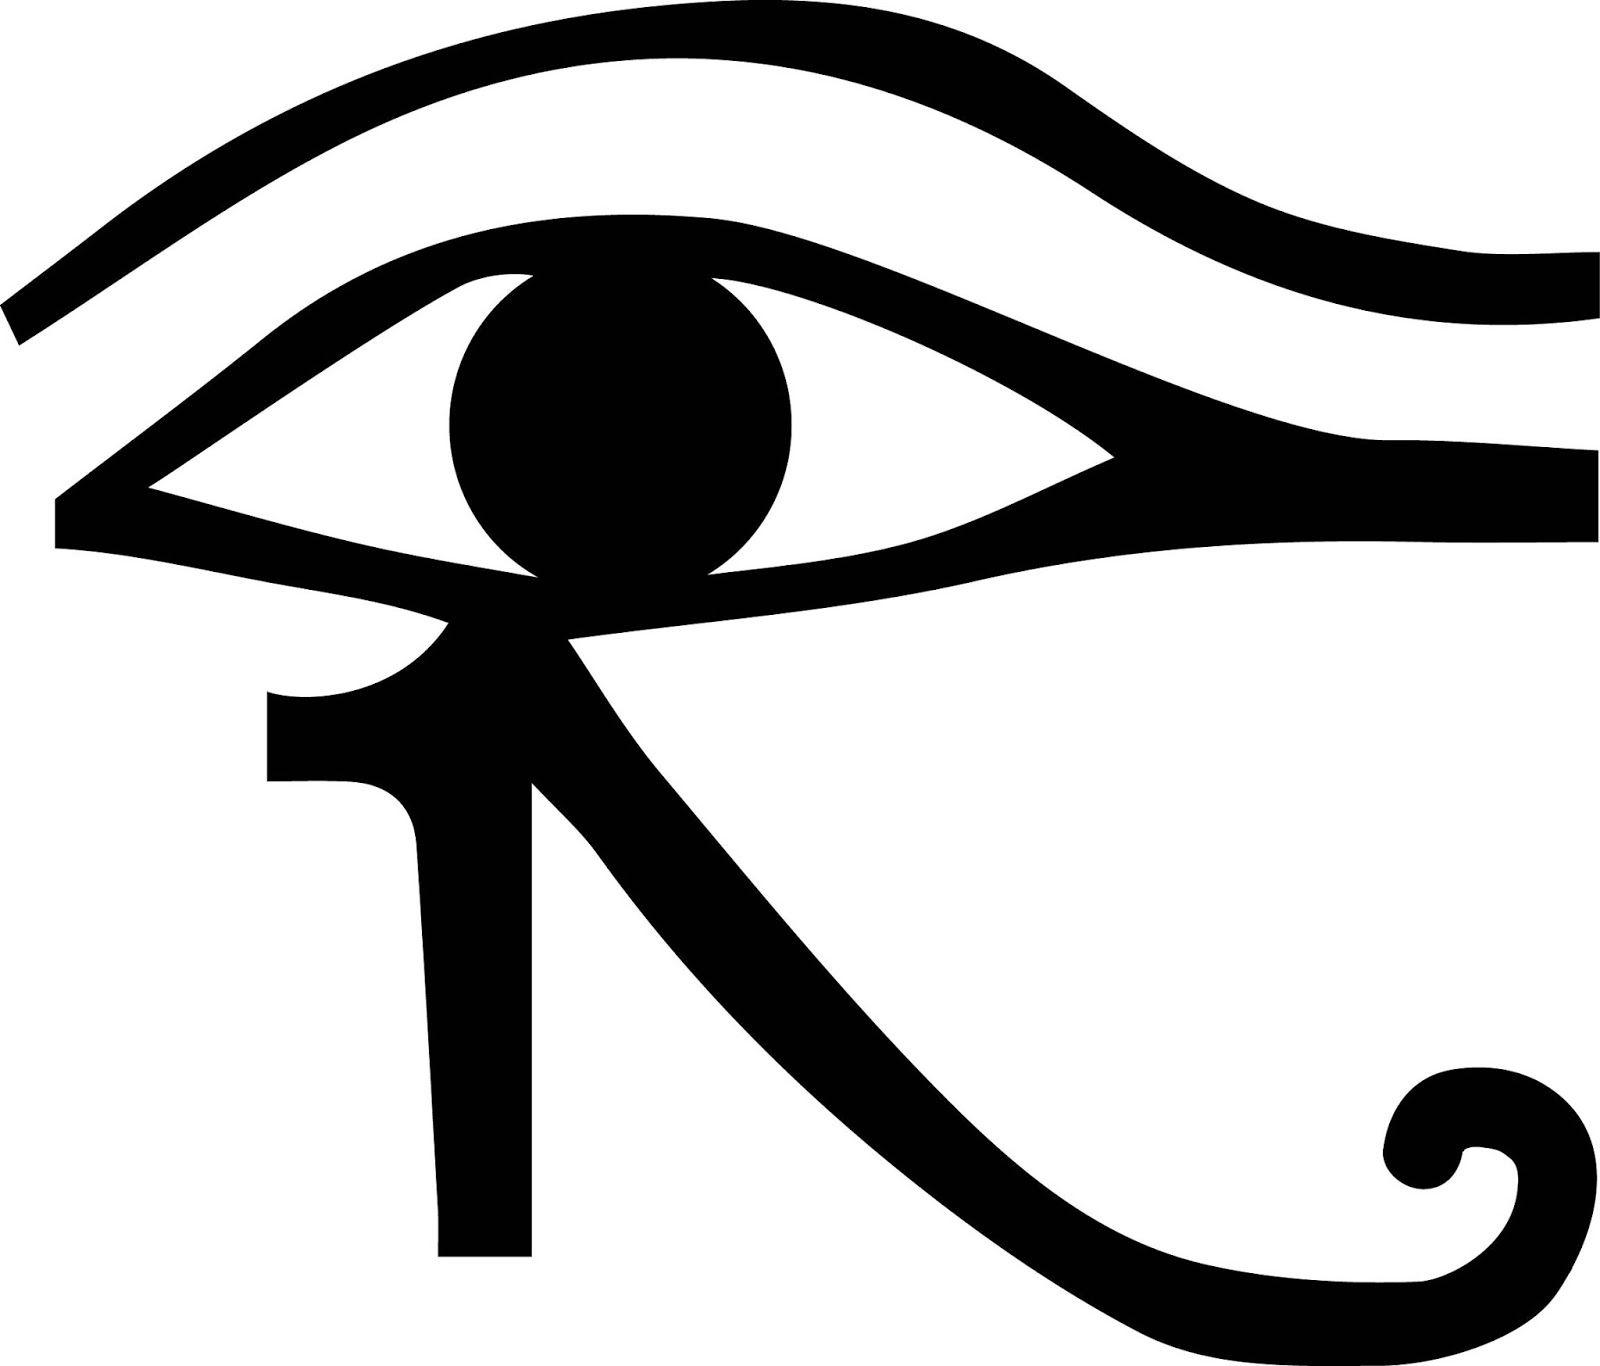 Sticker Oeil D Horus Autre Tattoos Egyptian Et Egypt